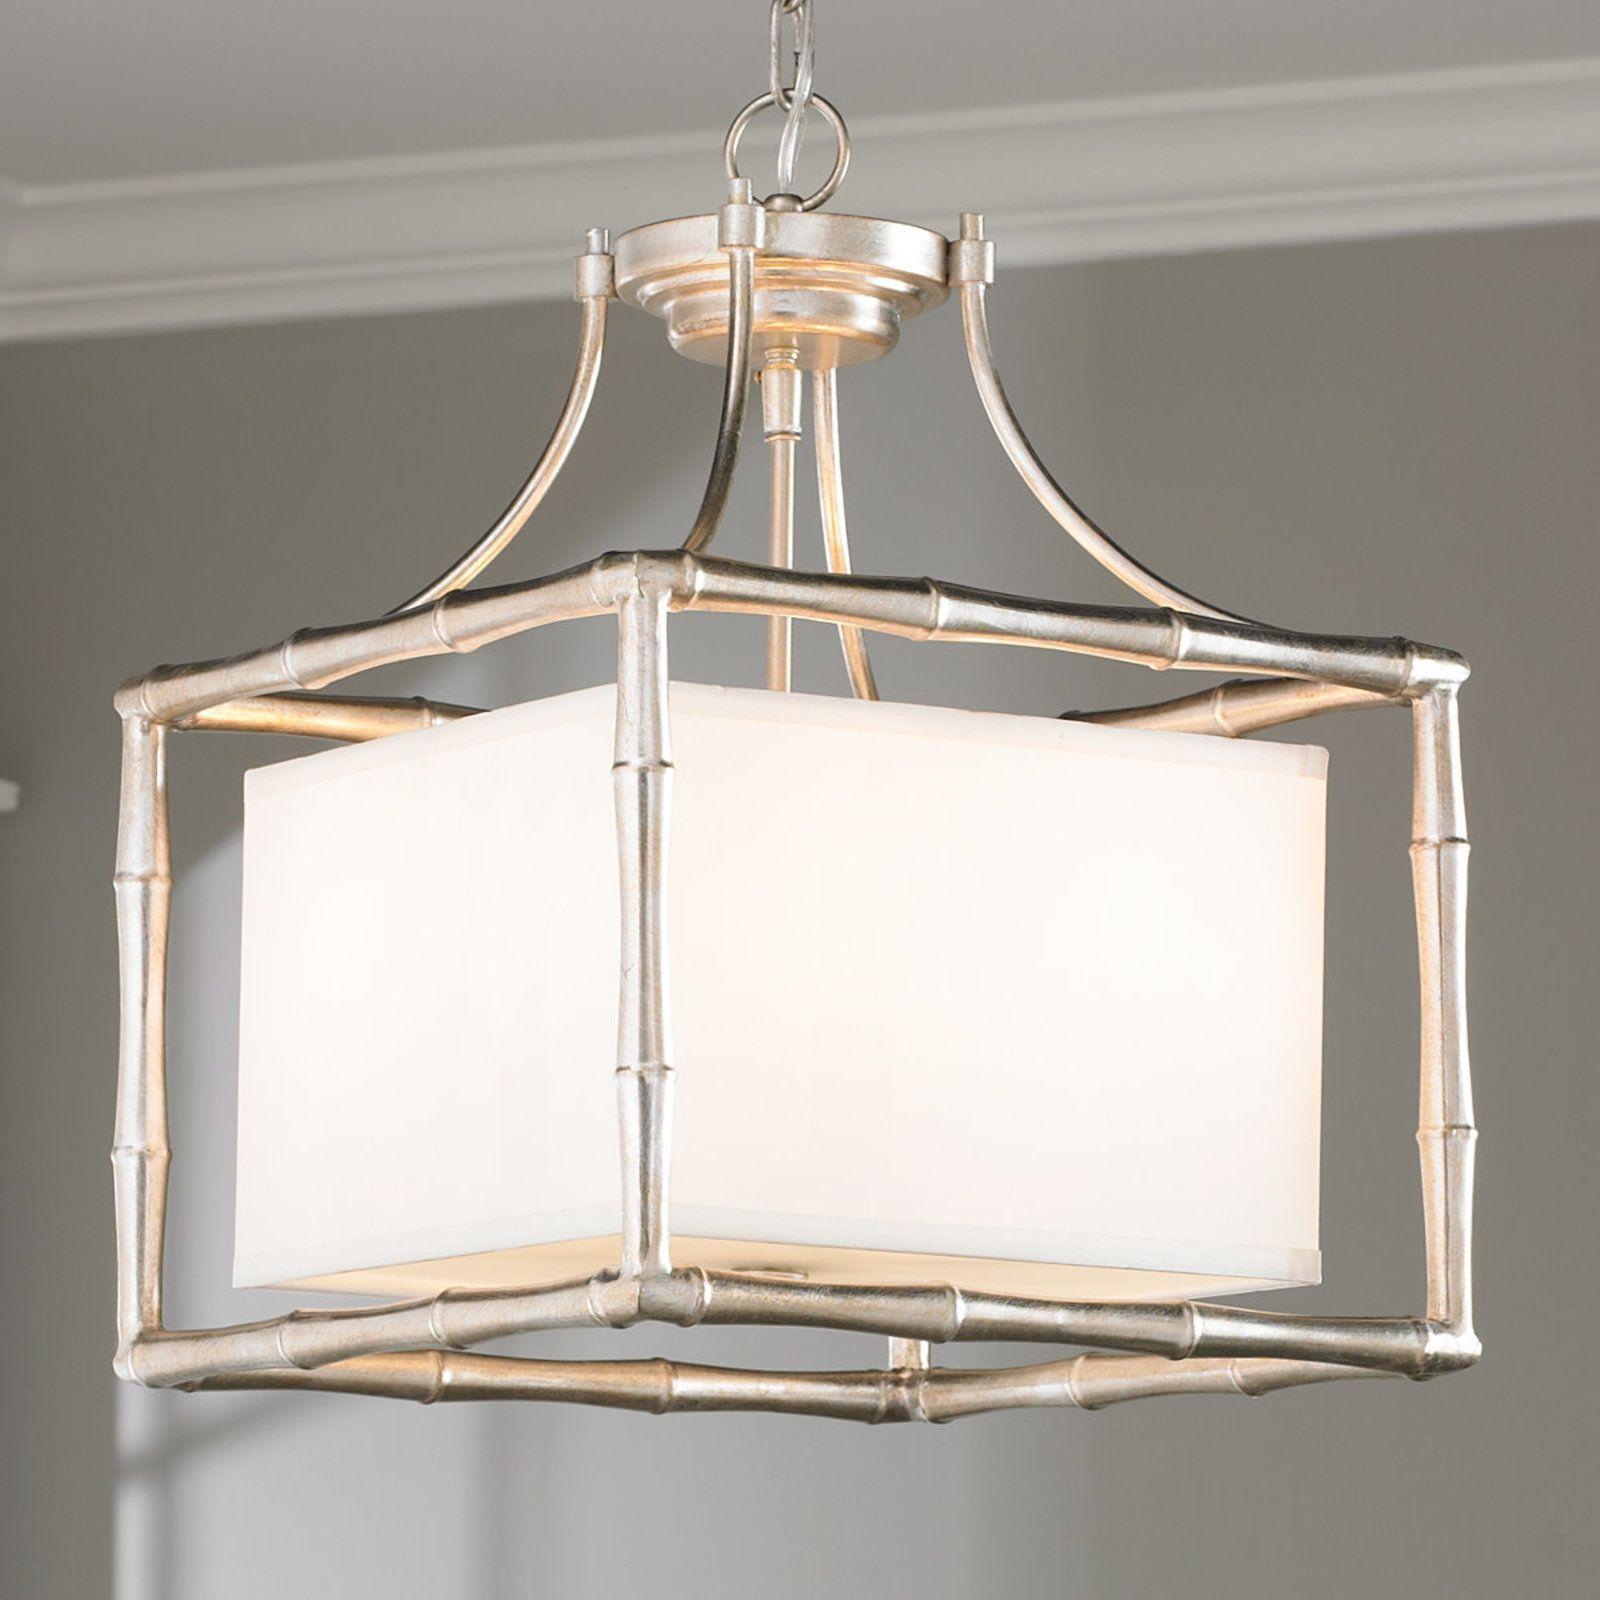 Bamboo square shade pendant lights bath and kitchens